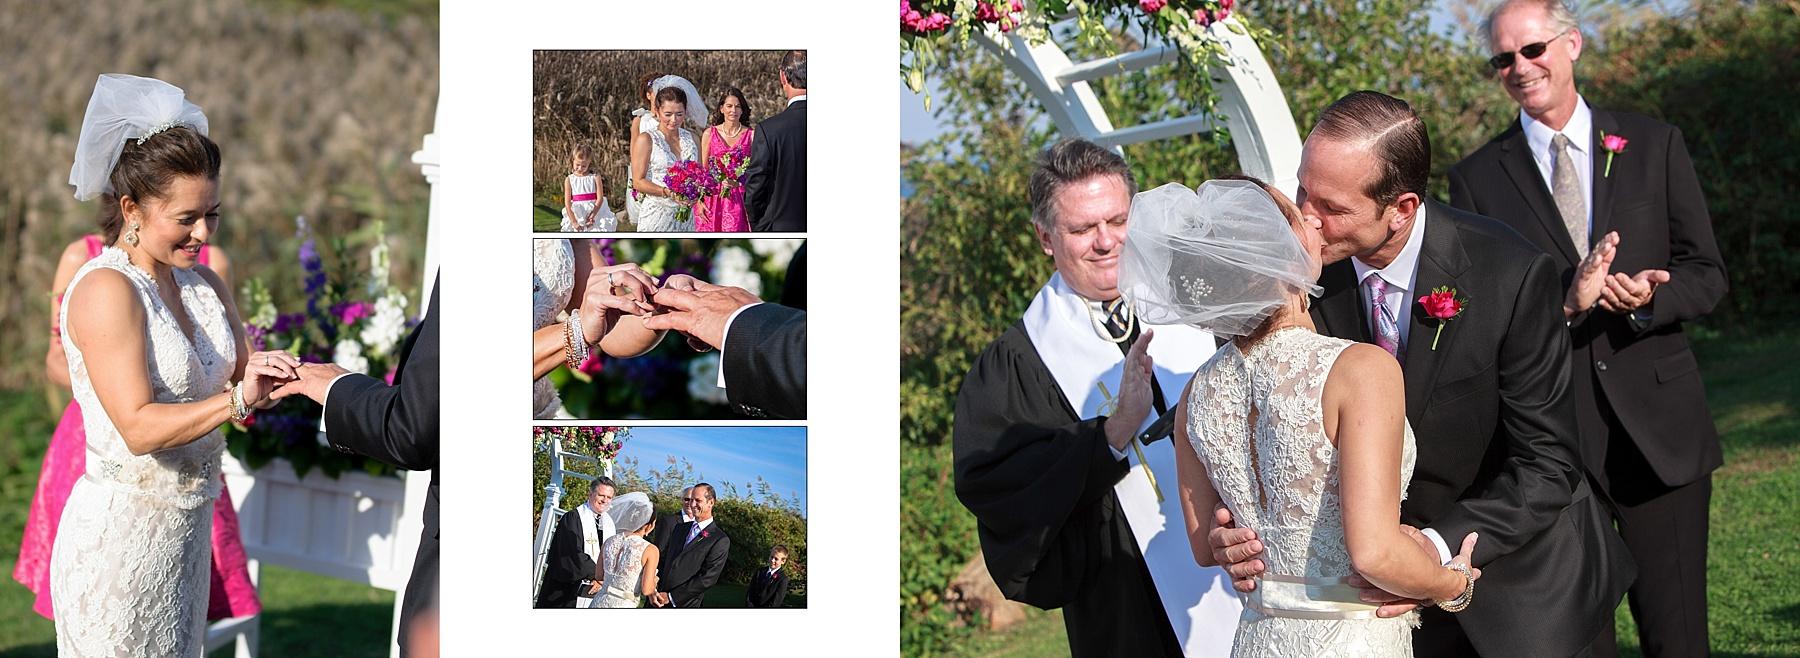 spread08_Wedding Album_Block Island RI WEB.jpg